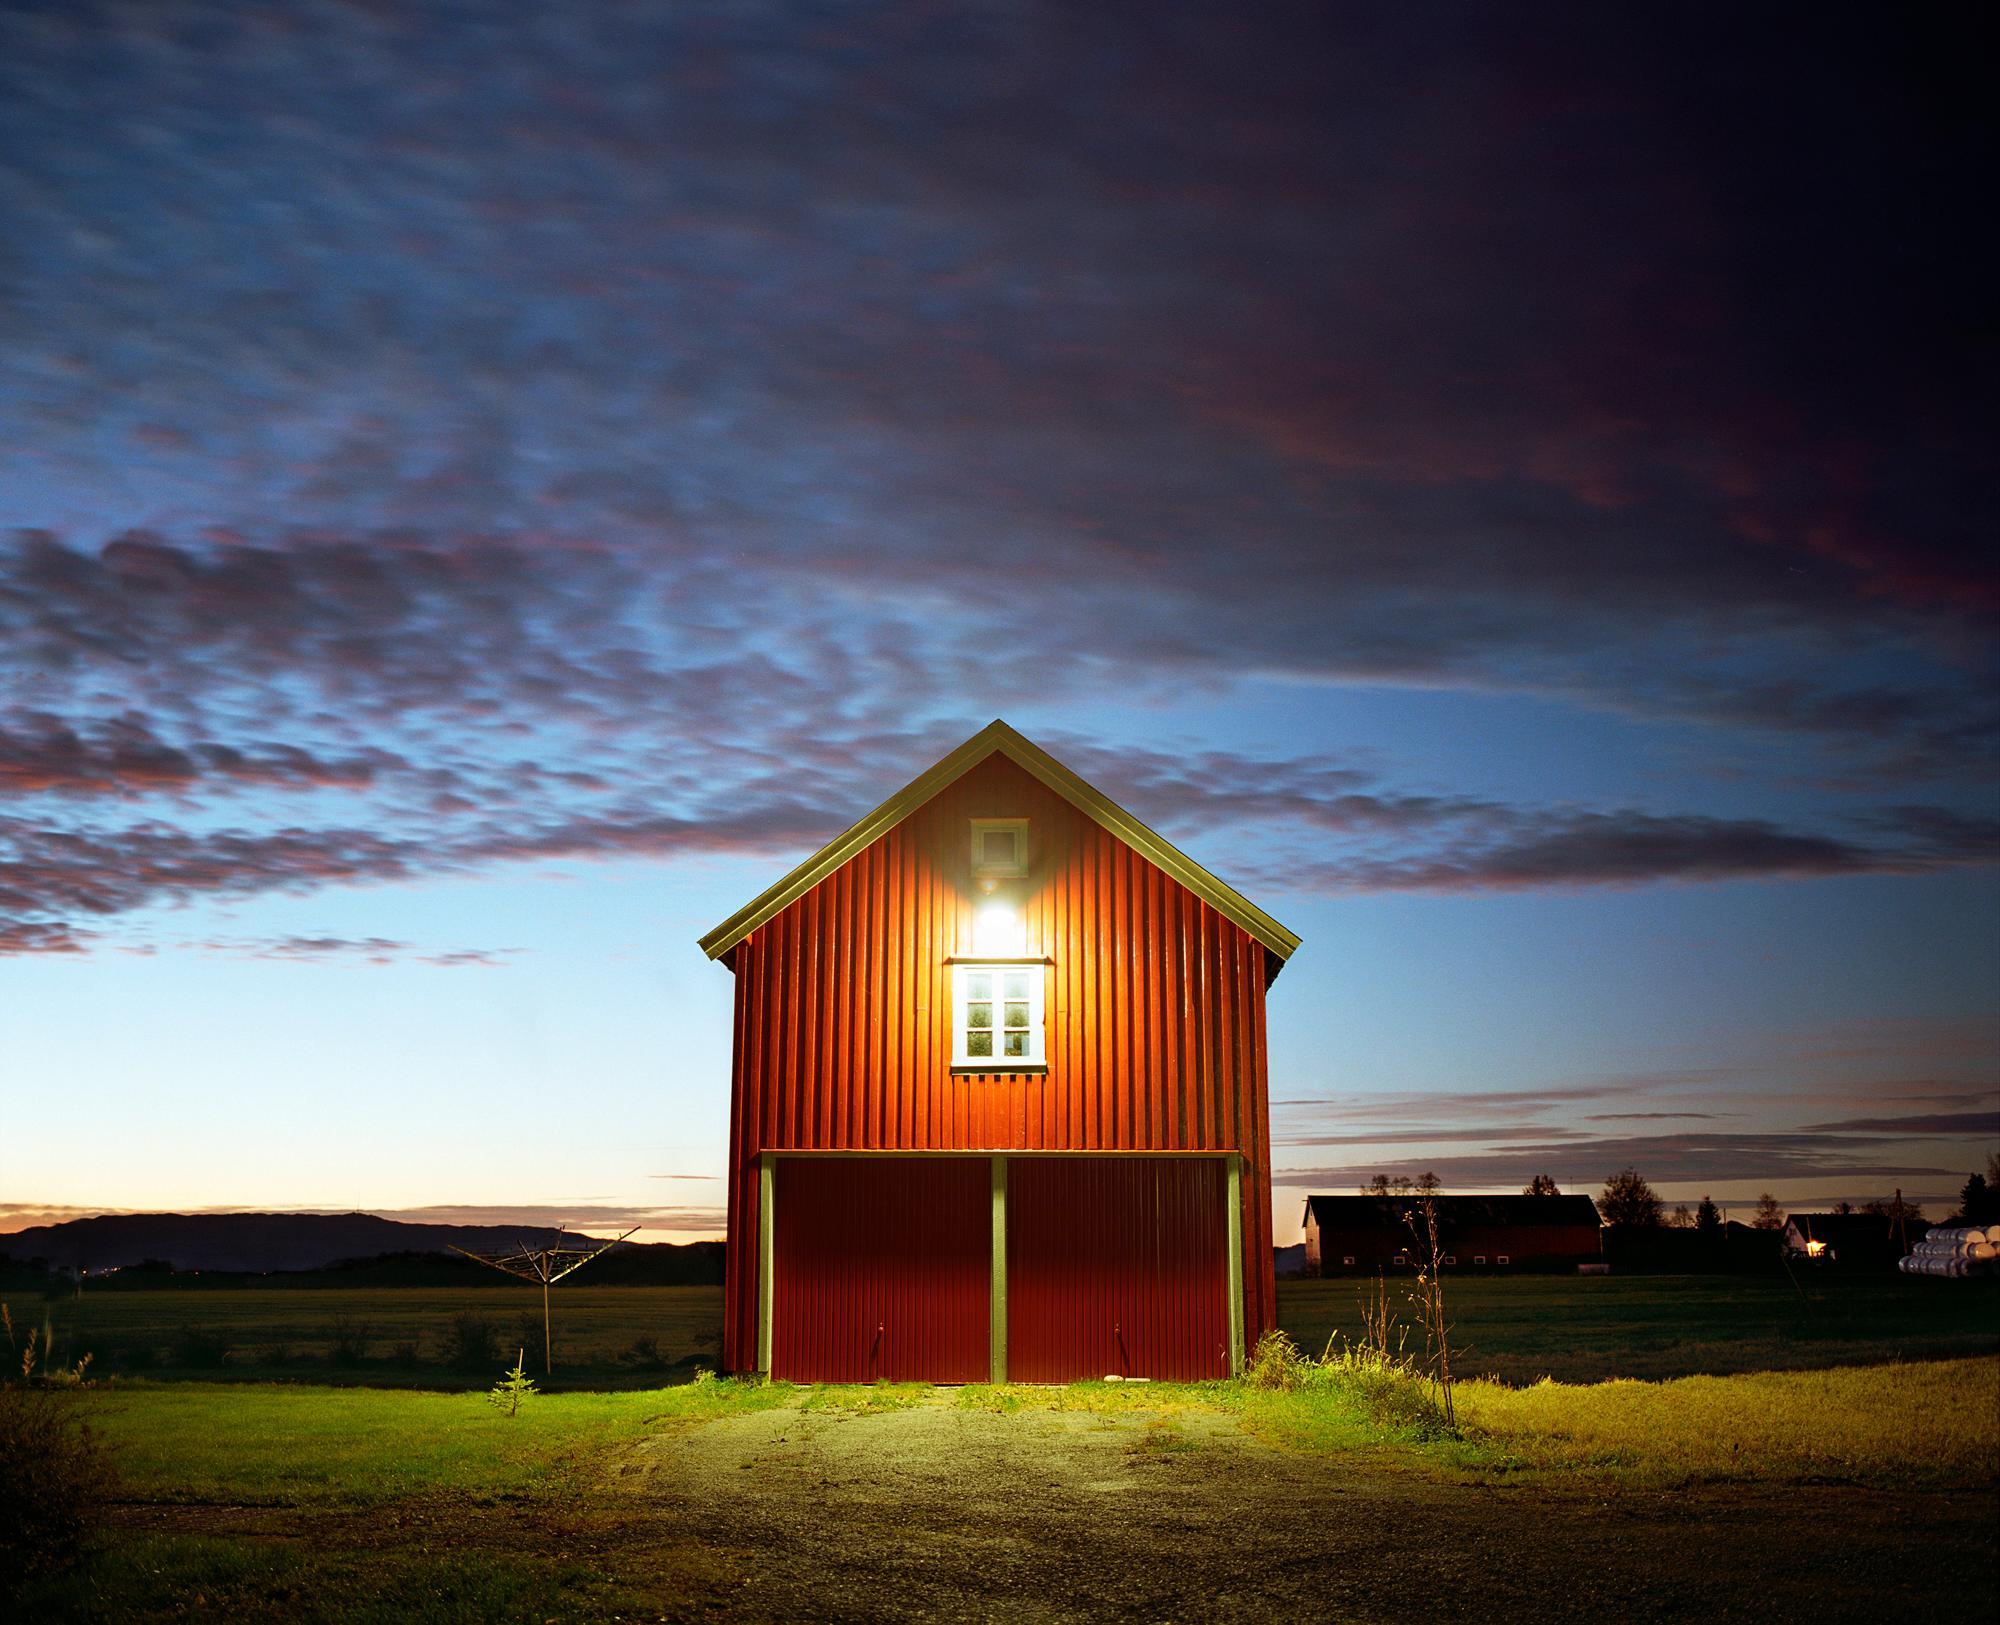 Barn - Samuel Hicks, Contemporary, Photography, Landscape, Sunset, Nature